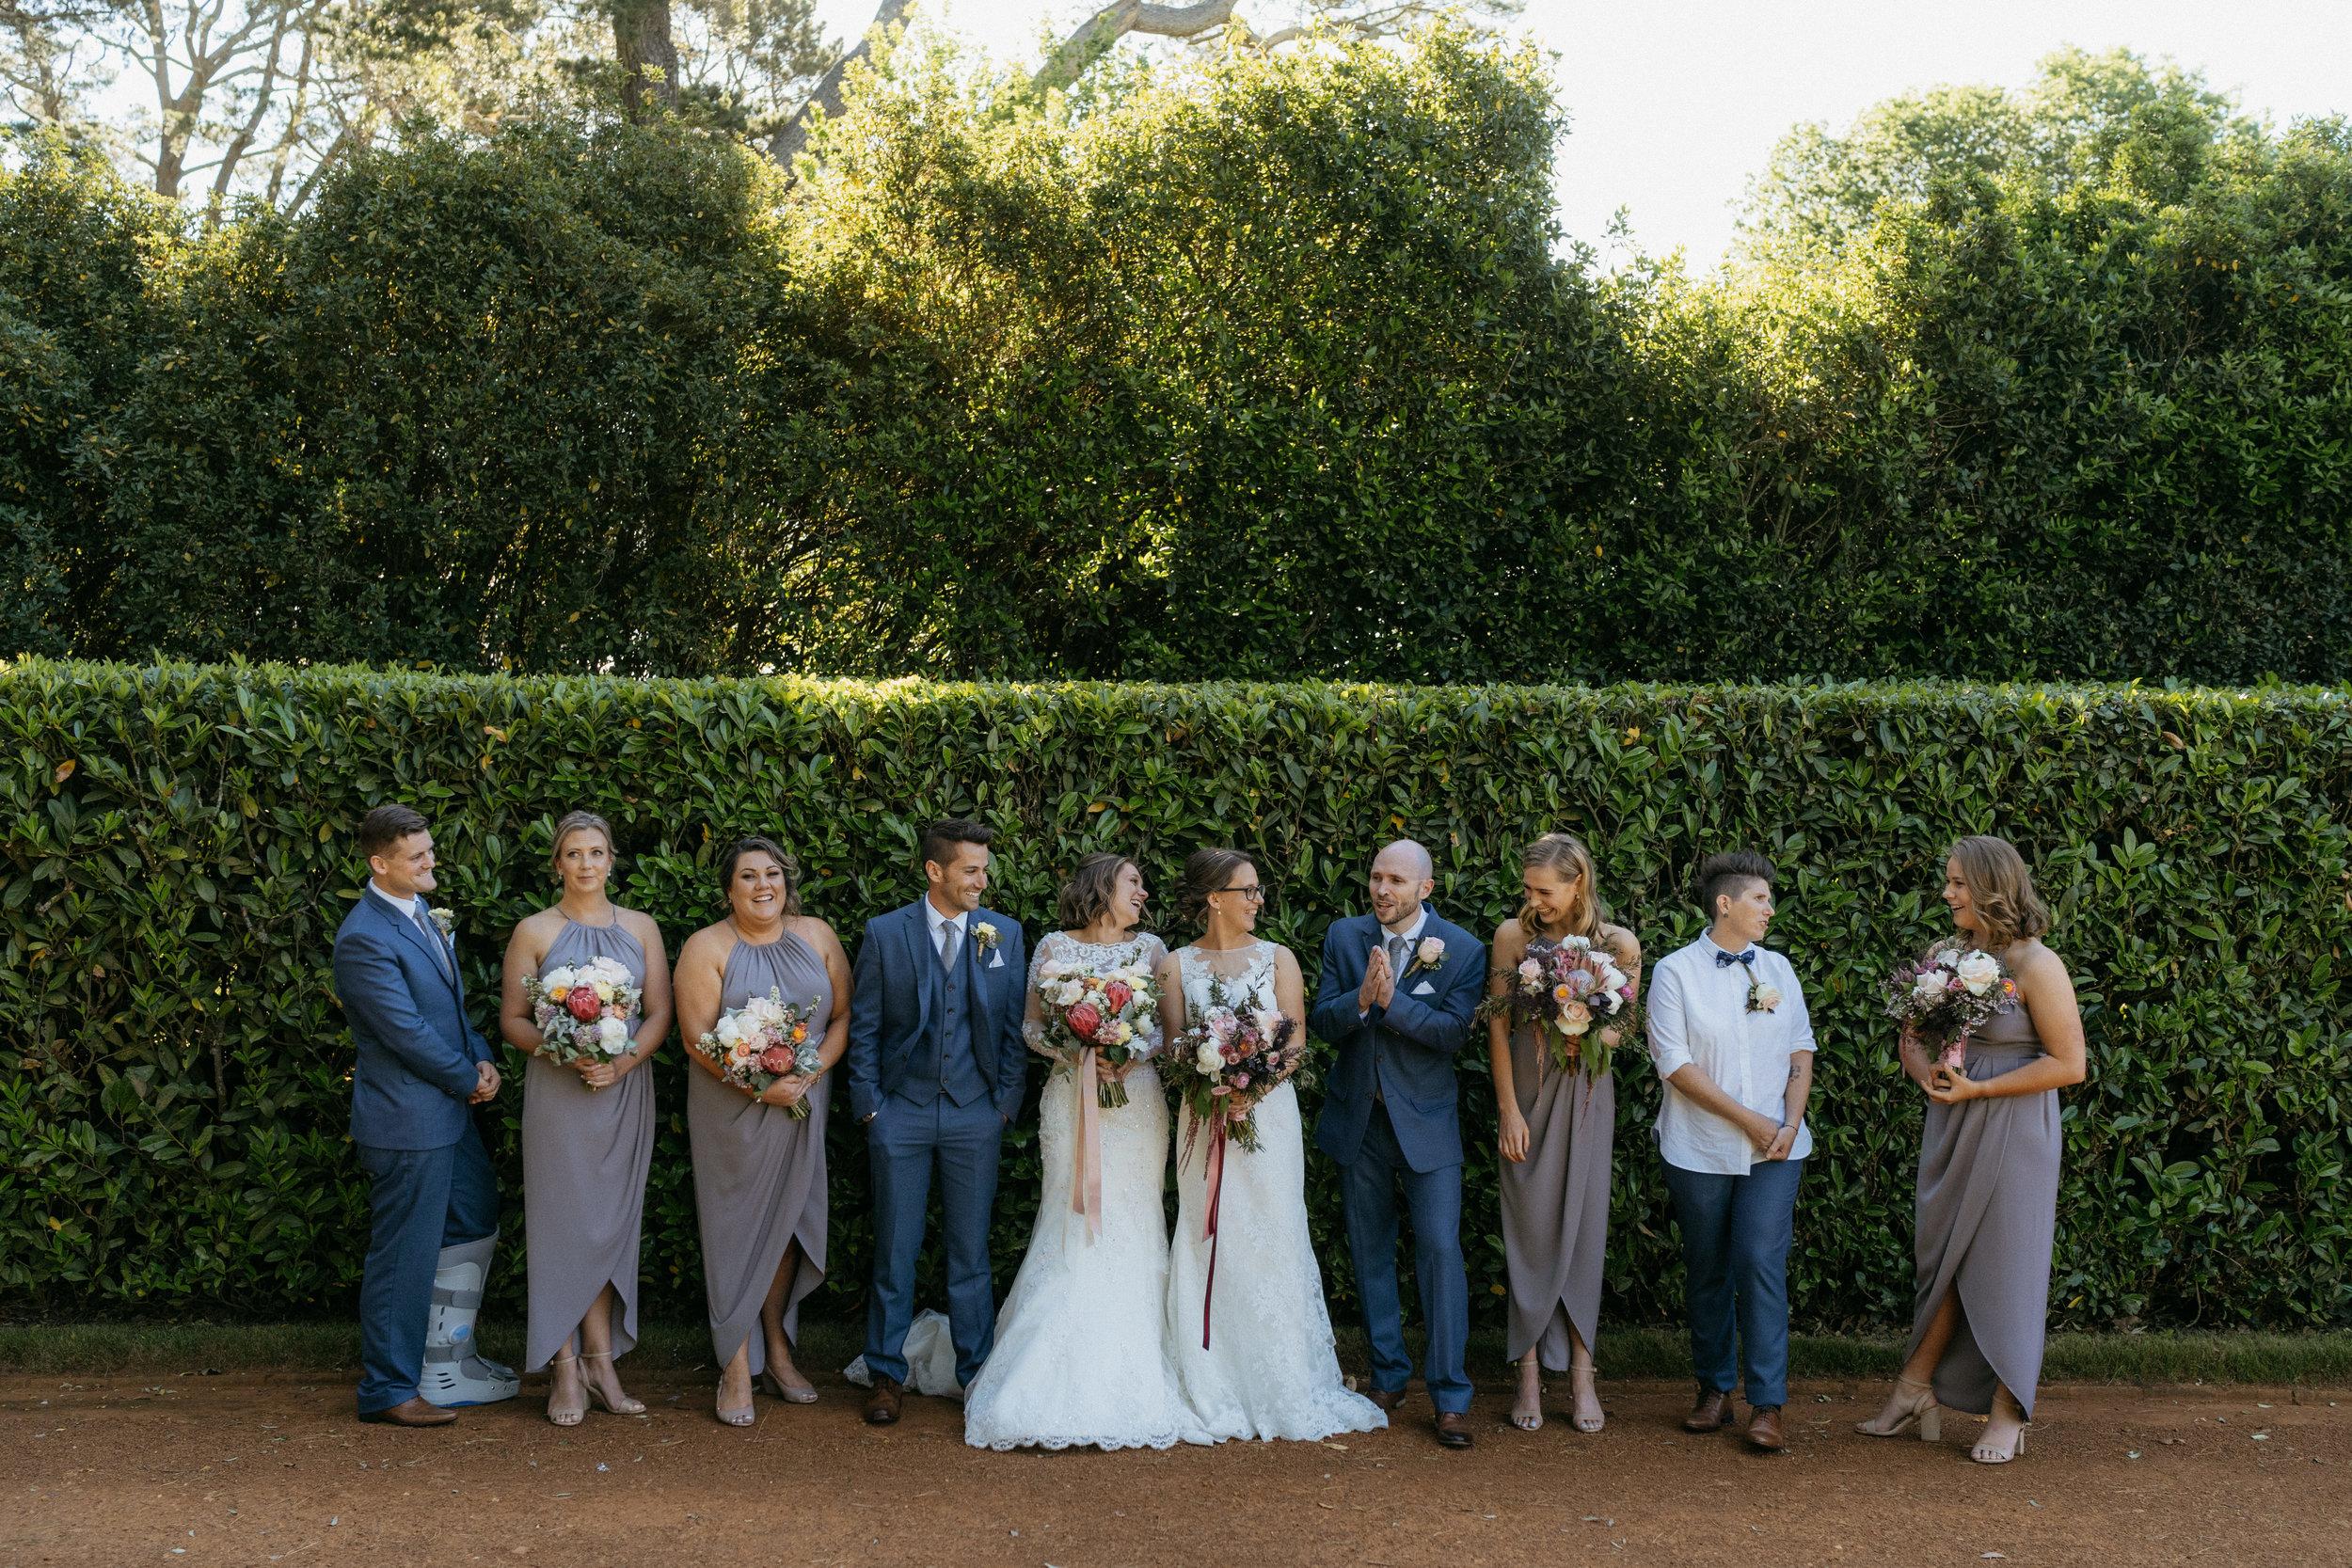 kate-lauren-wedding-276.jpg